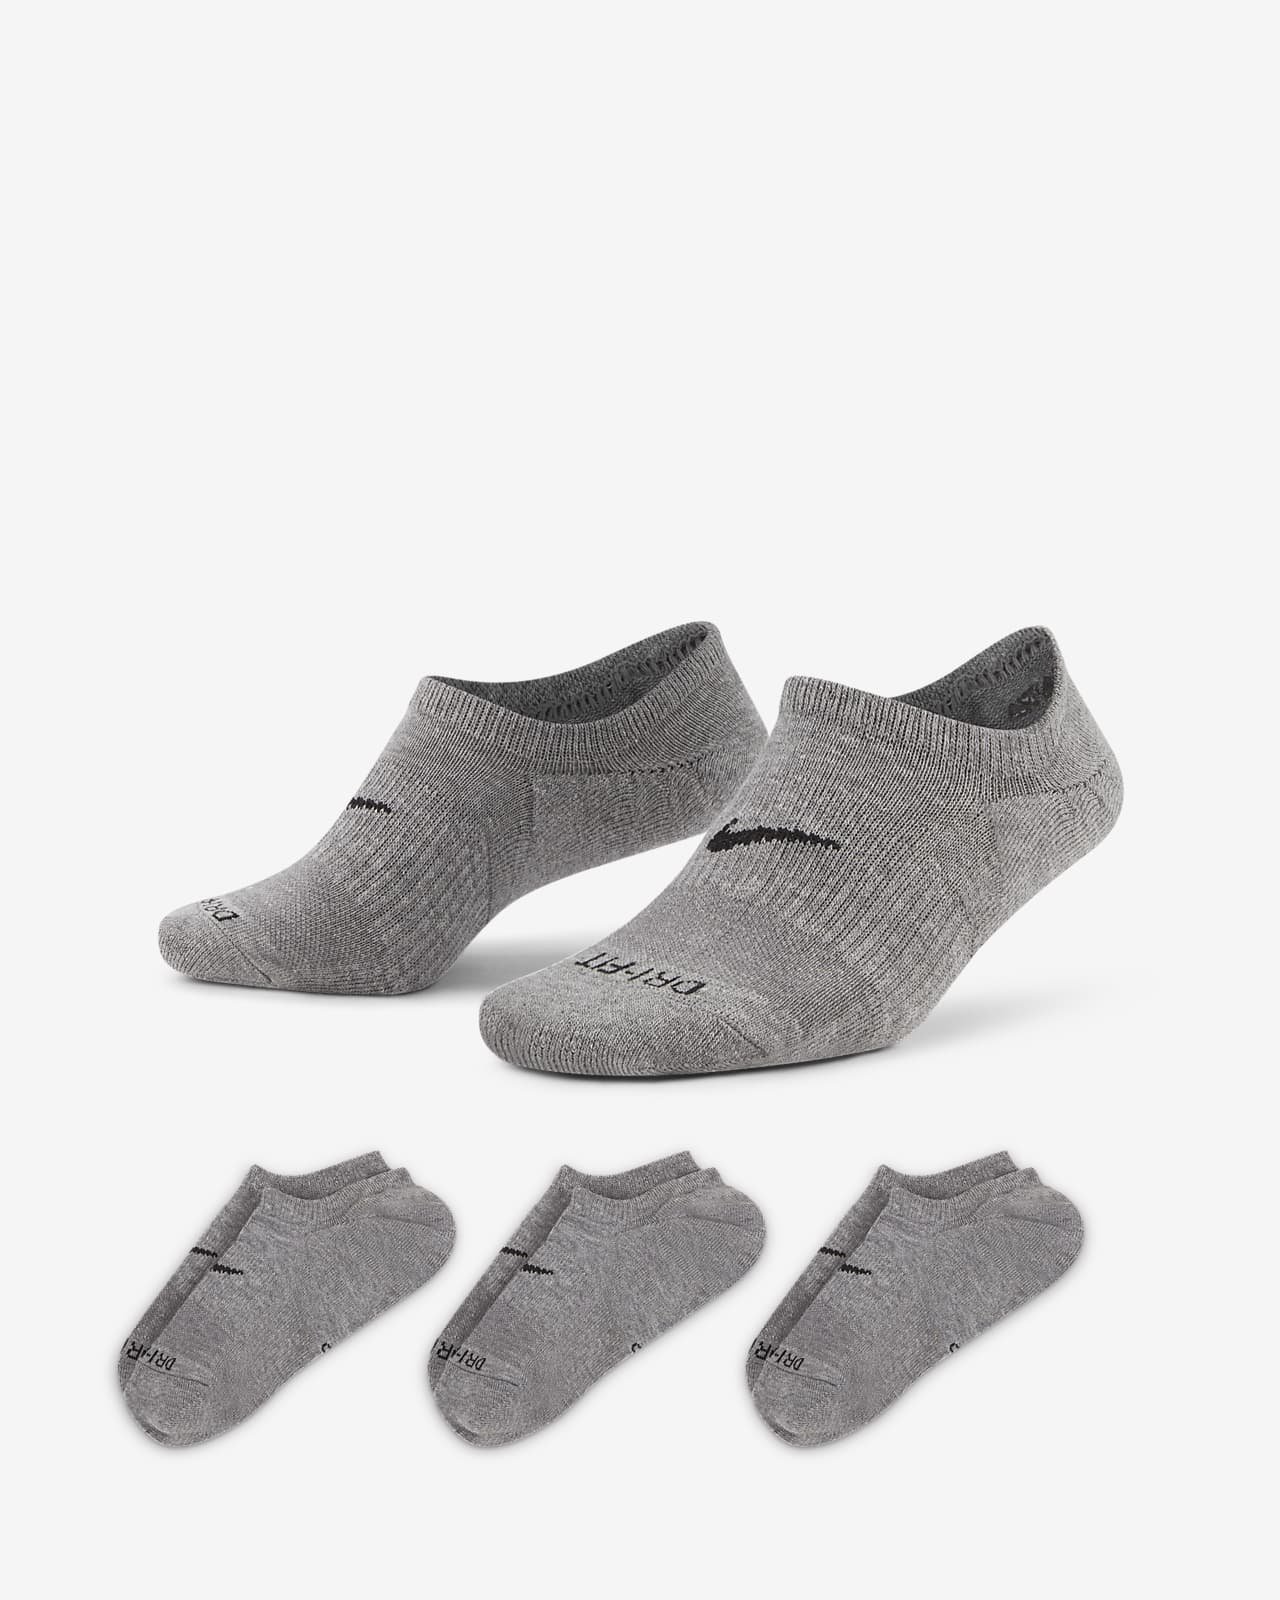 Calcetines invisibles de entrenamiento para mujer Nike Everyday Plus Cushioned (3 pares)